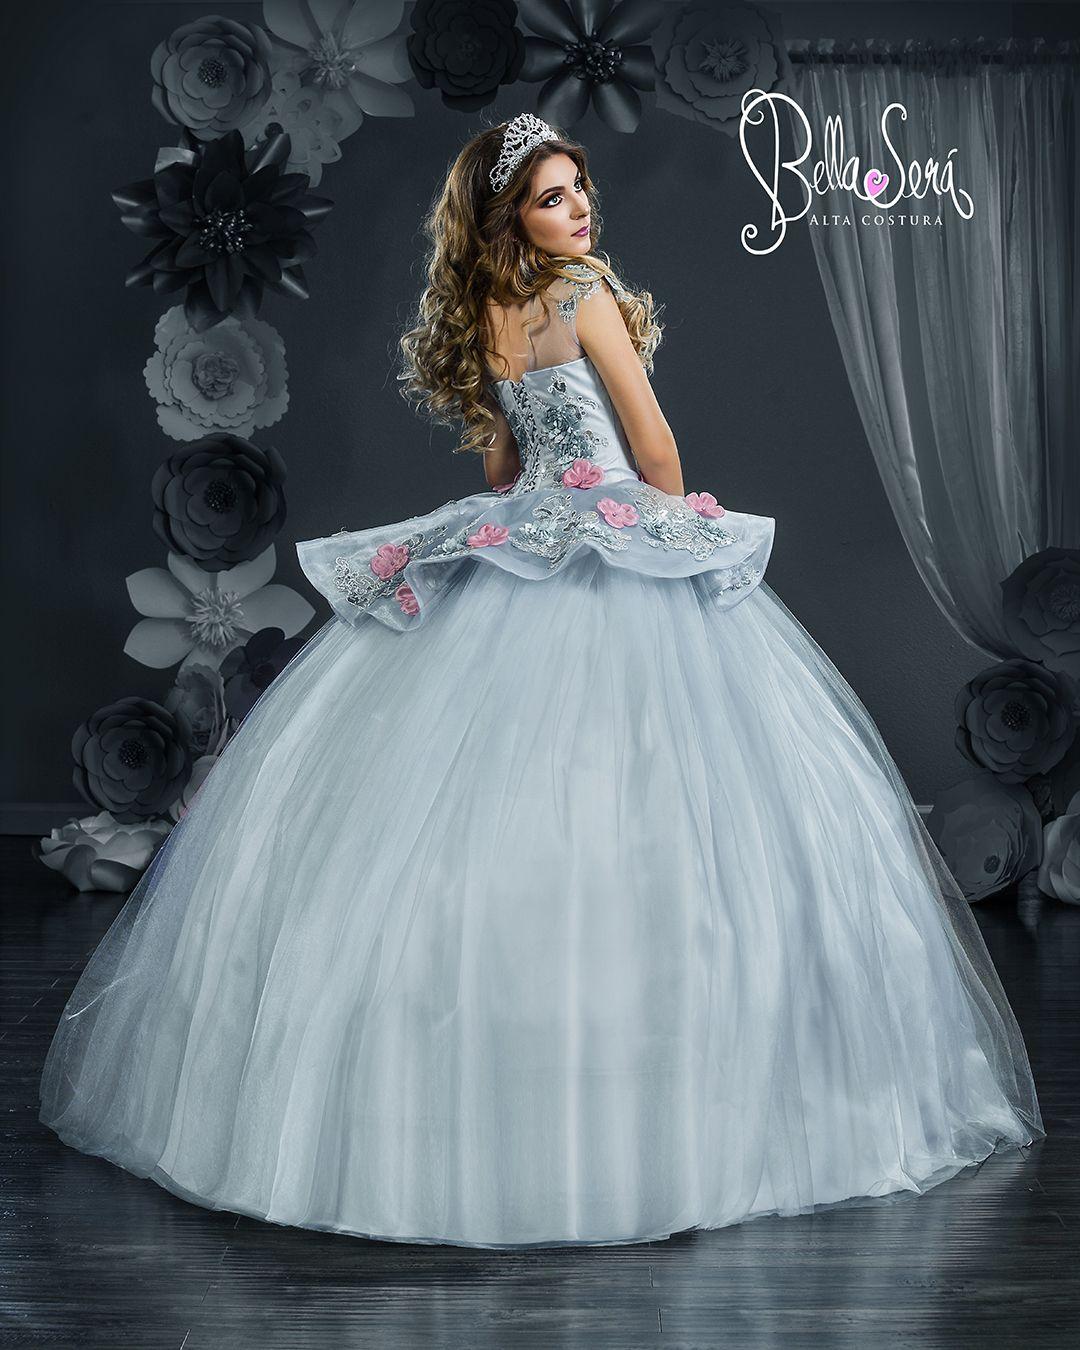 Quinceanera Dress 1813 - www.bellaseradresses.